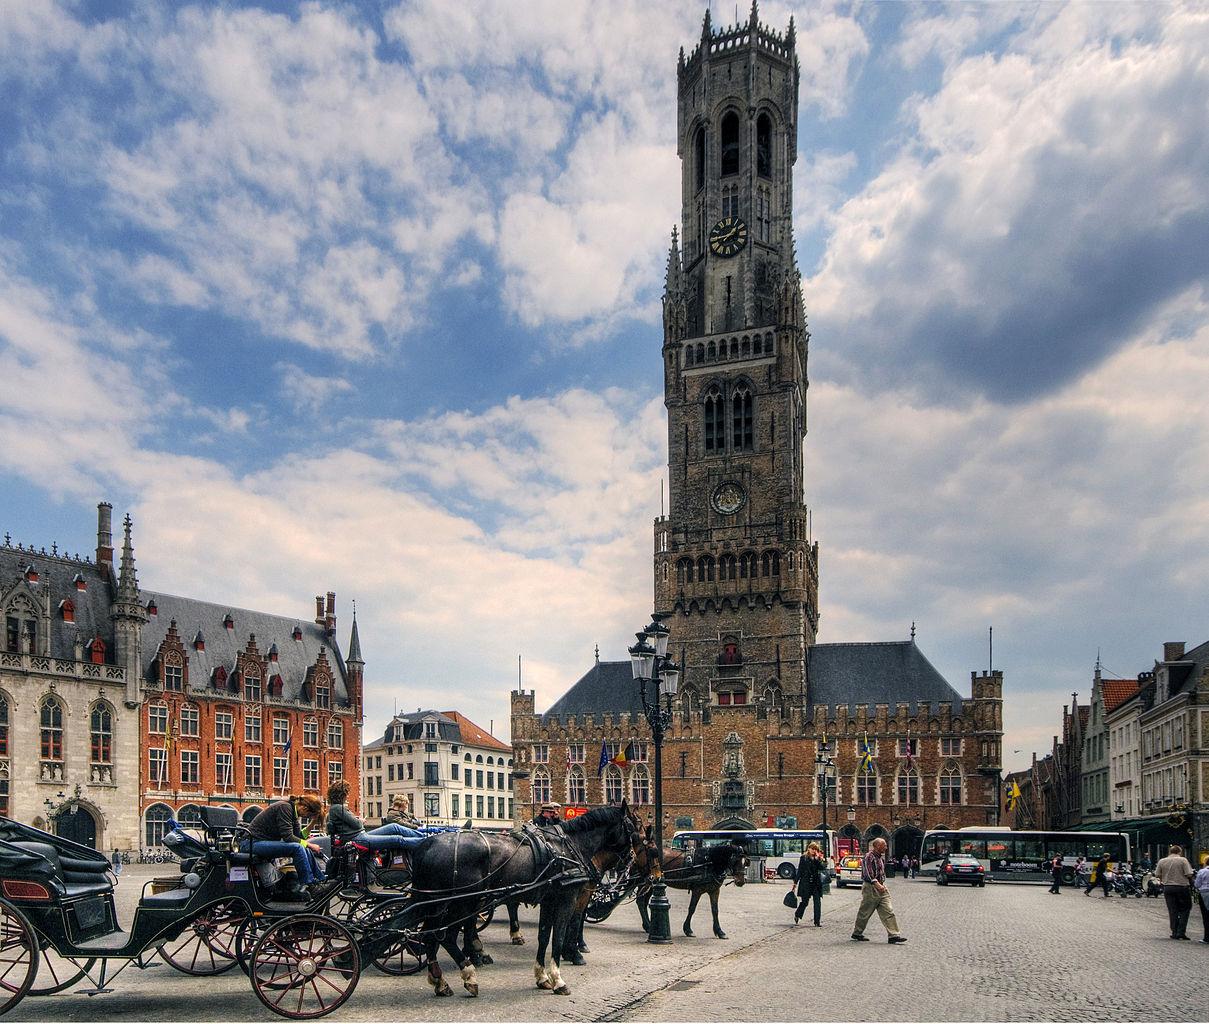 Turnul clopotnitei din Bruges111